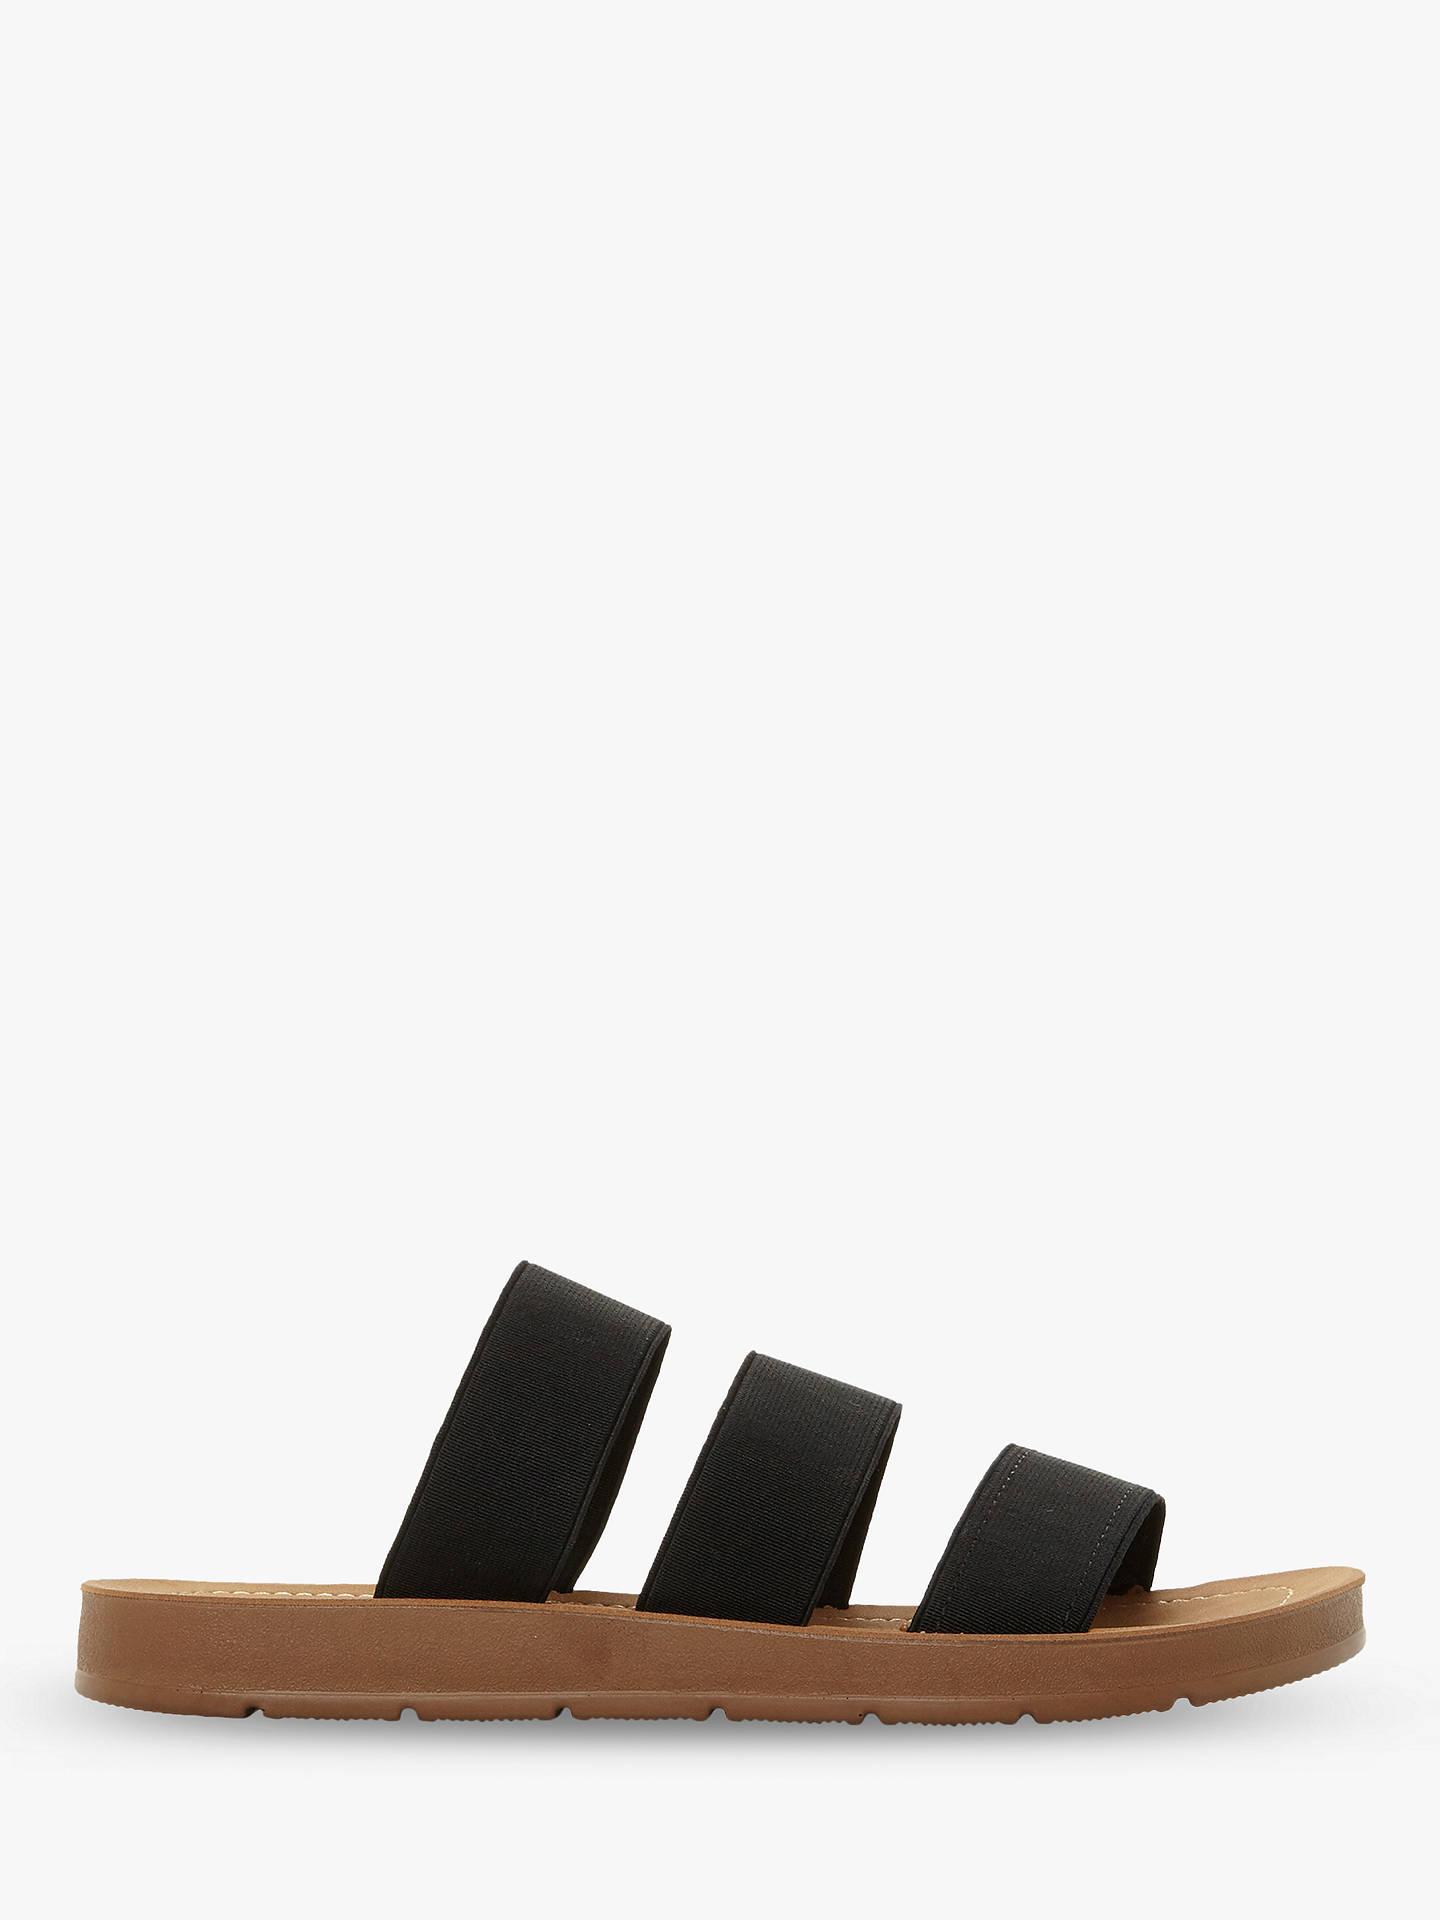 d27a63641eb Steve Madden Pascale Slip On Flat Sandals, Black